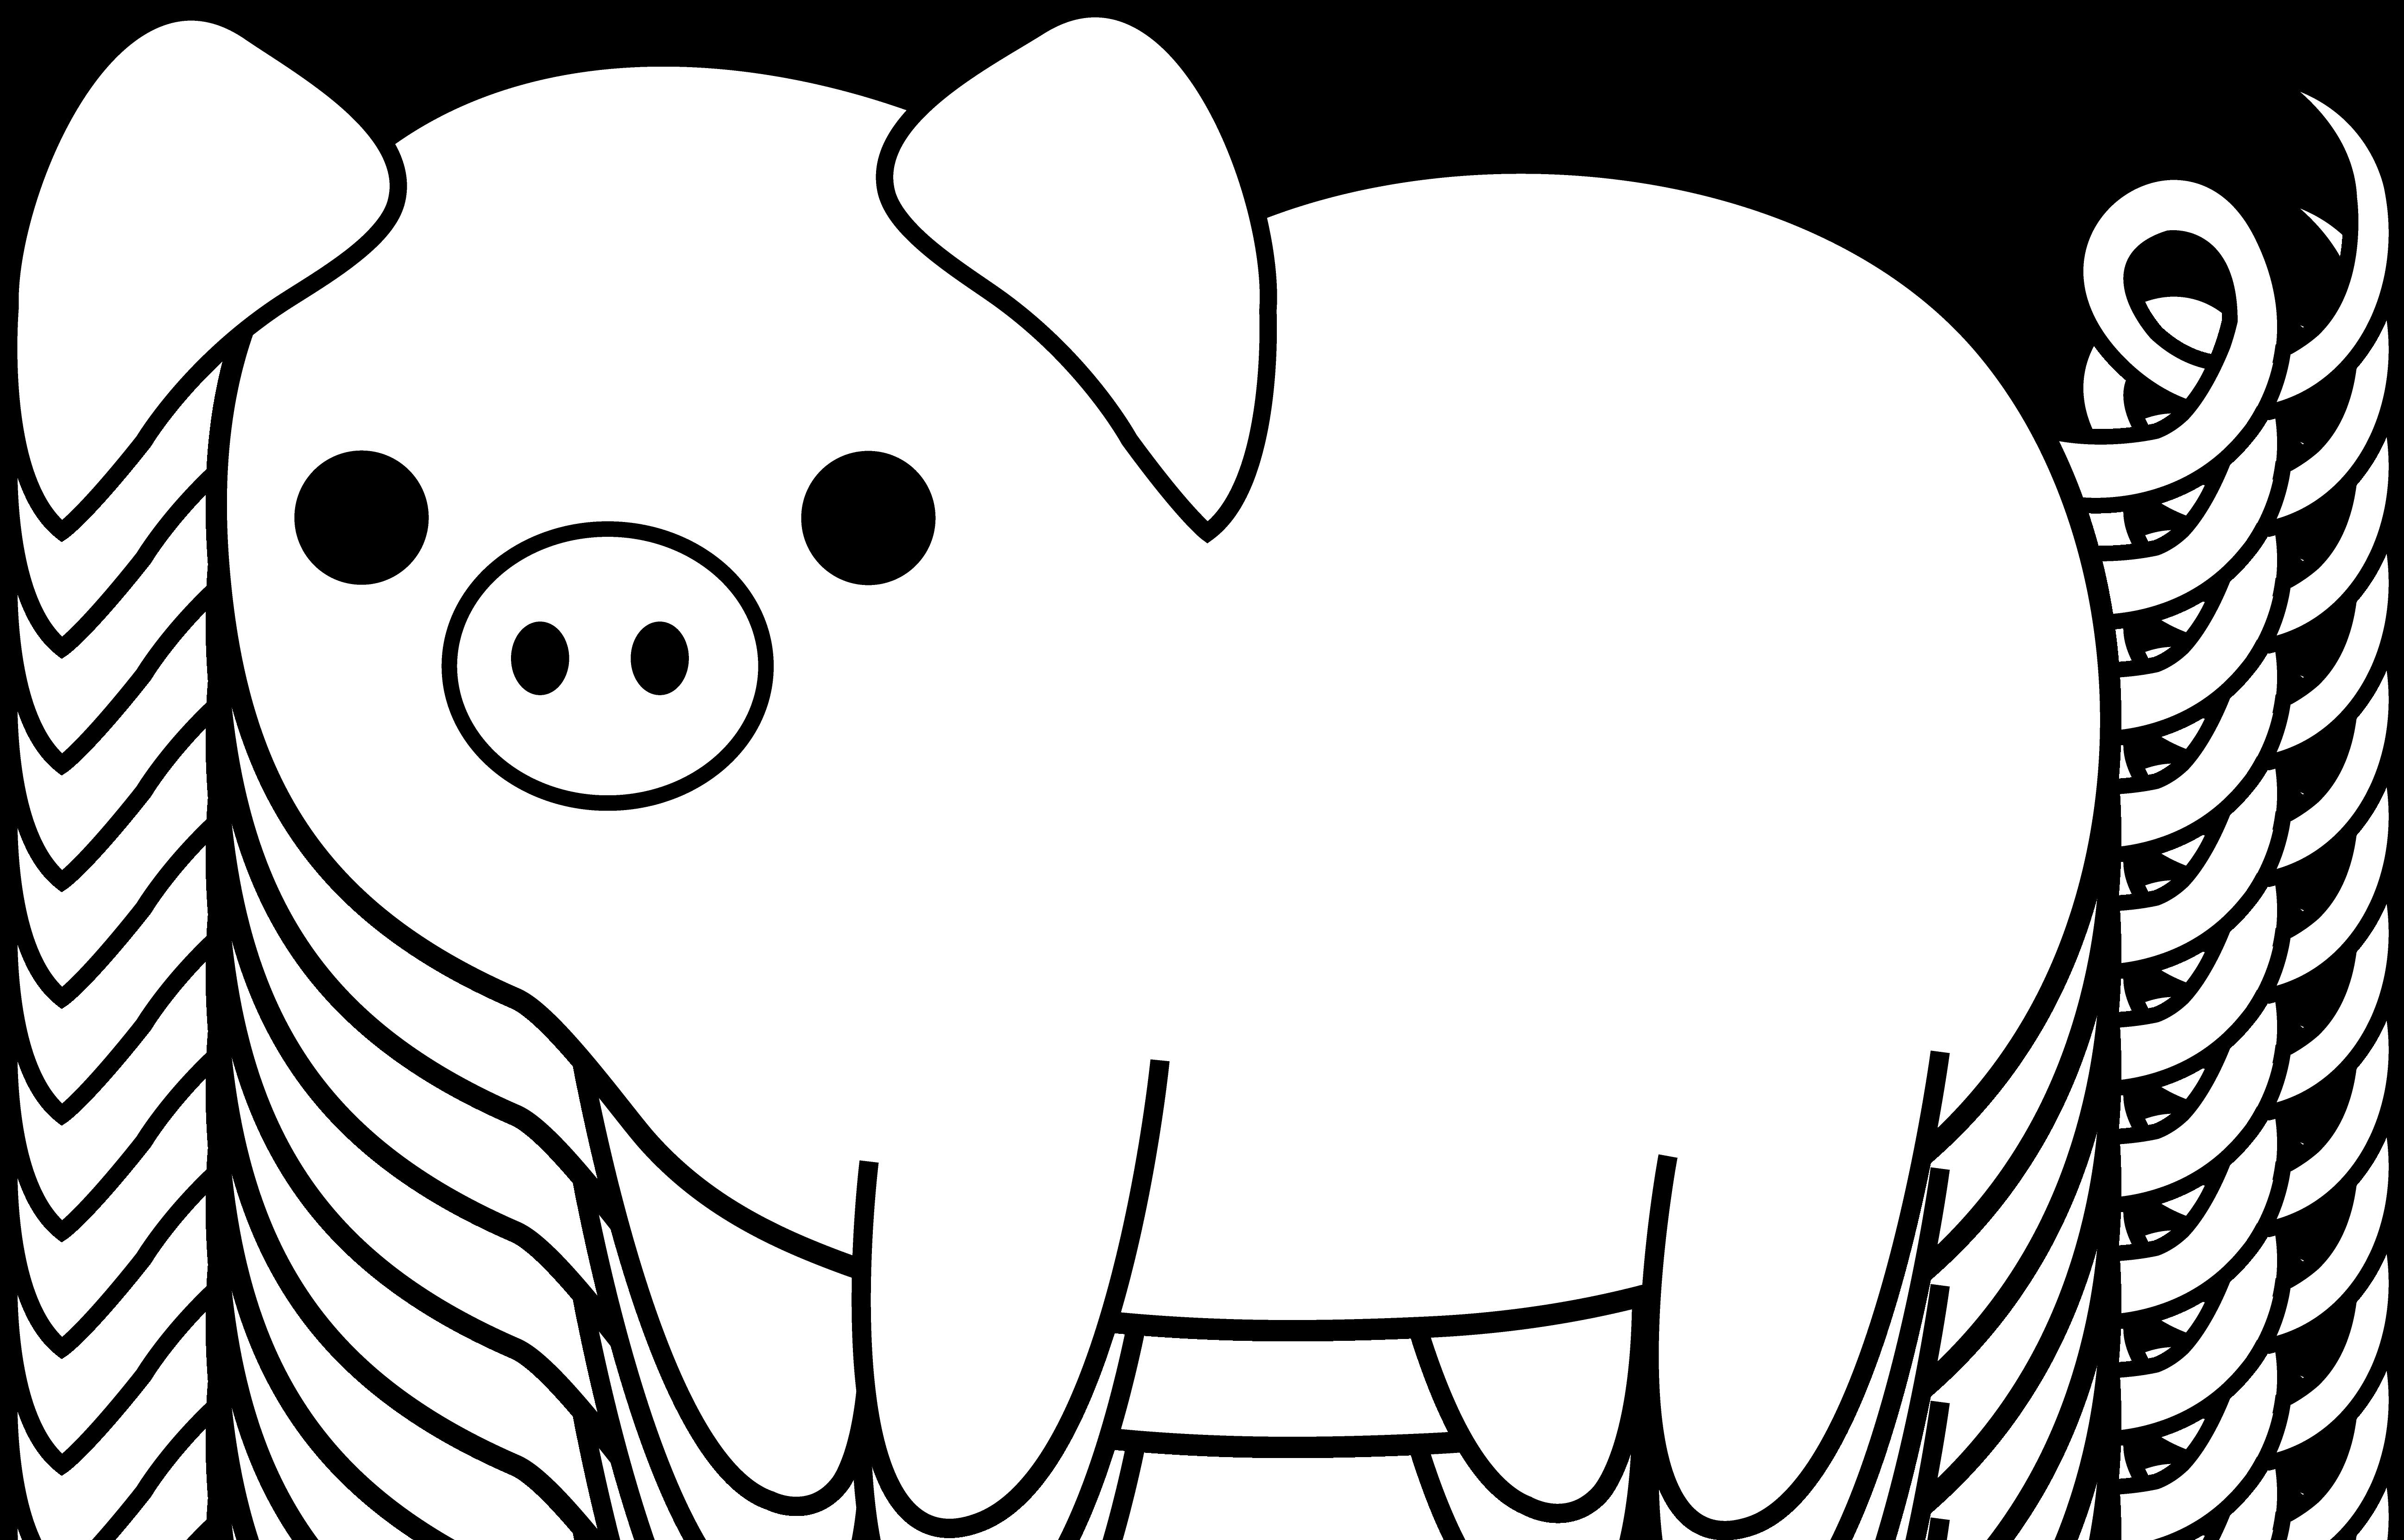 medium resolution of cute black and white pig